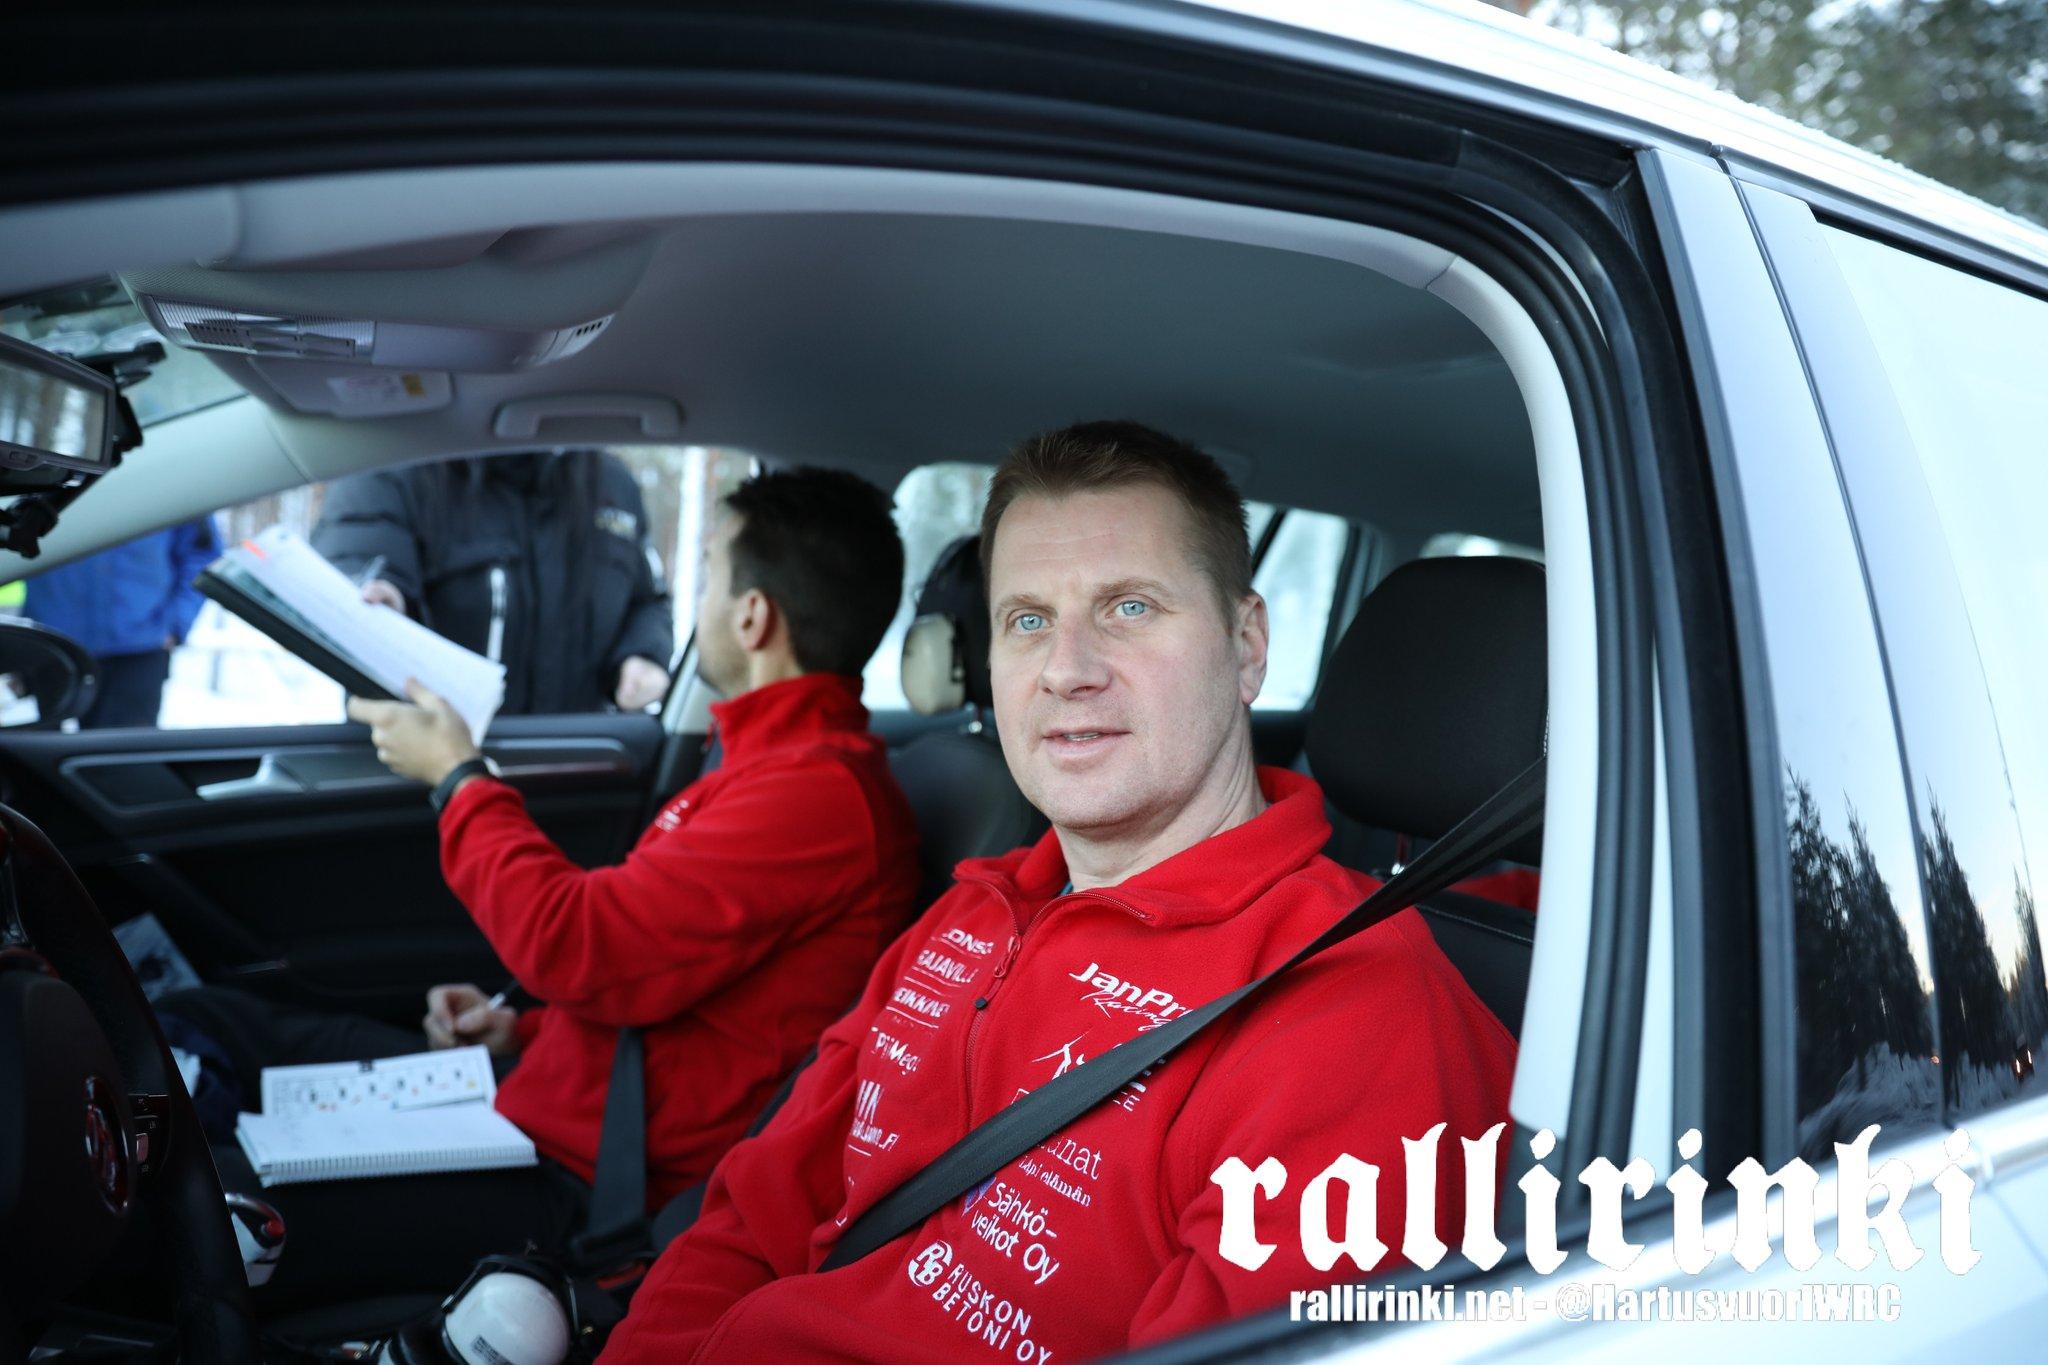 WRC: 67º Rallye Sweden [14-17 Febrero] - Página 2 DzN0-bHWkAIAQeC